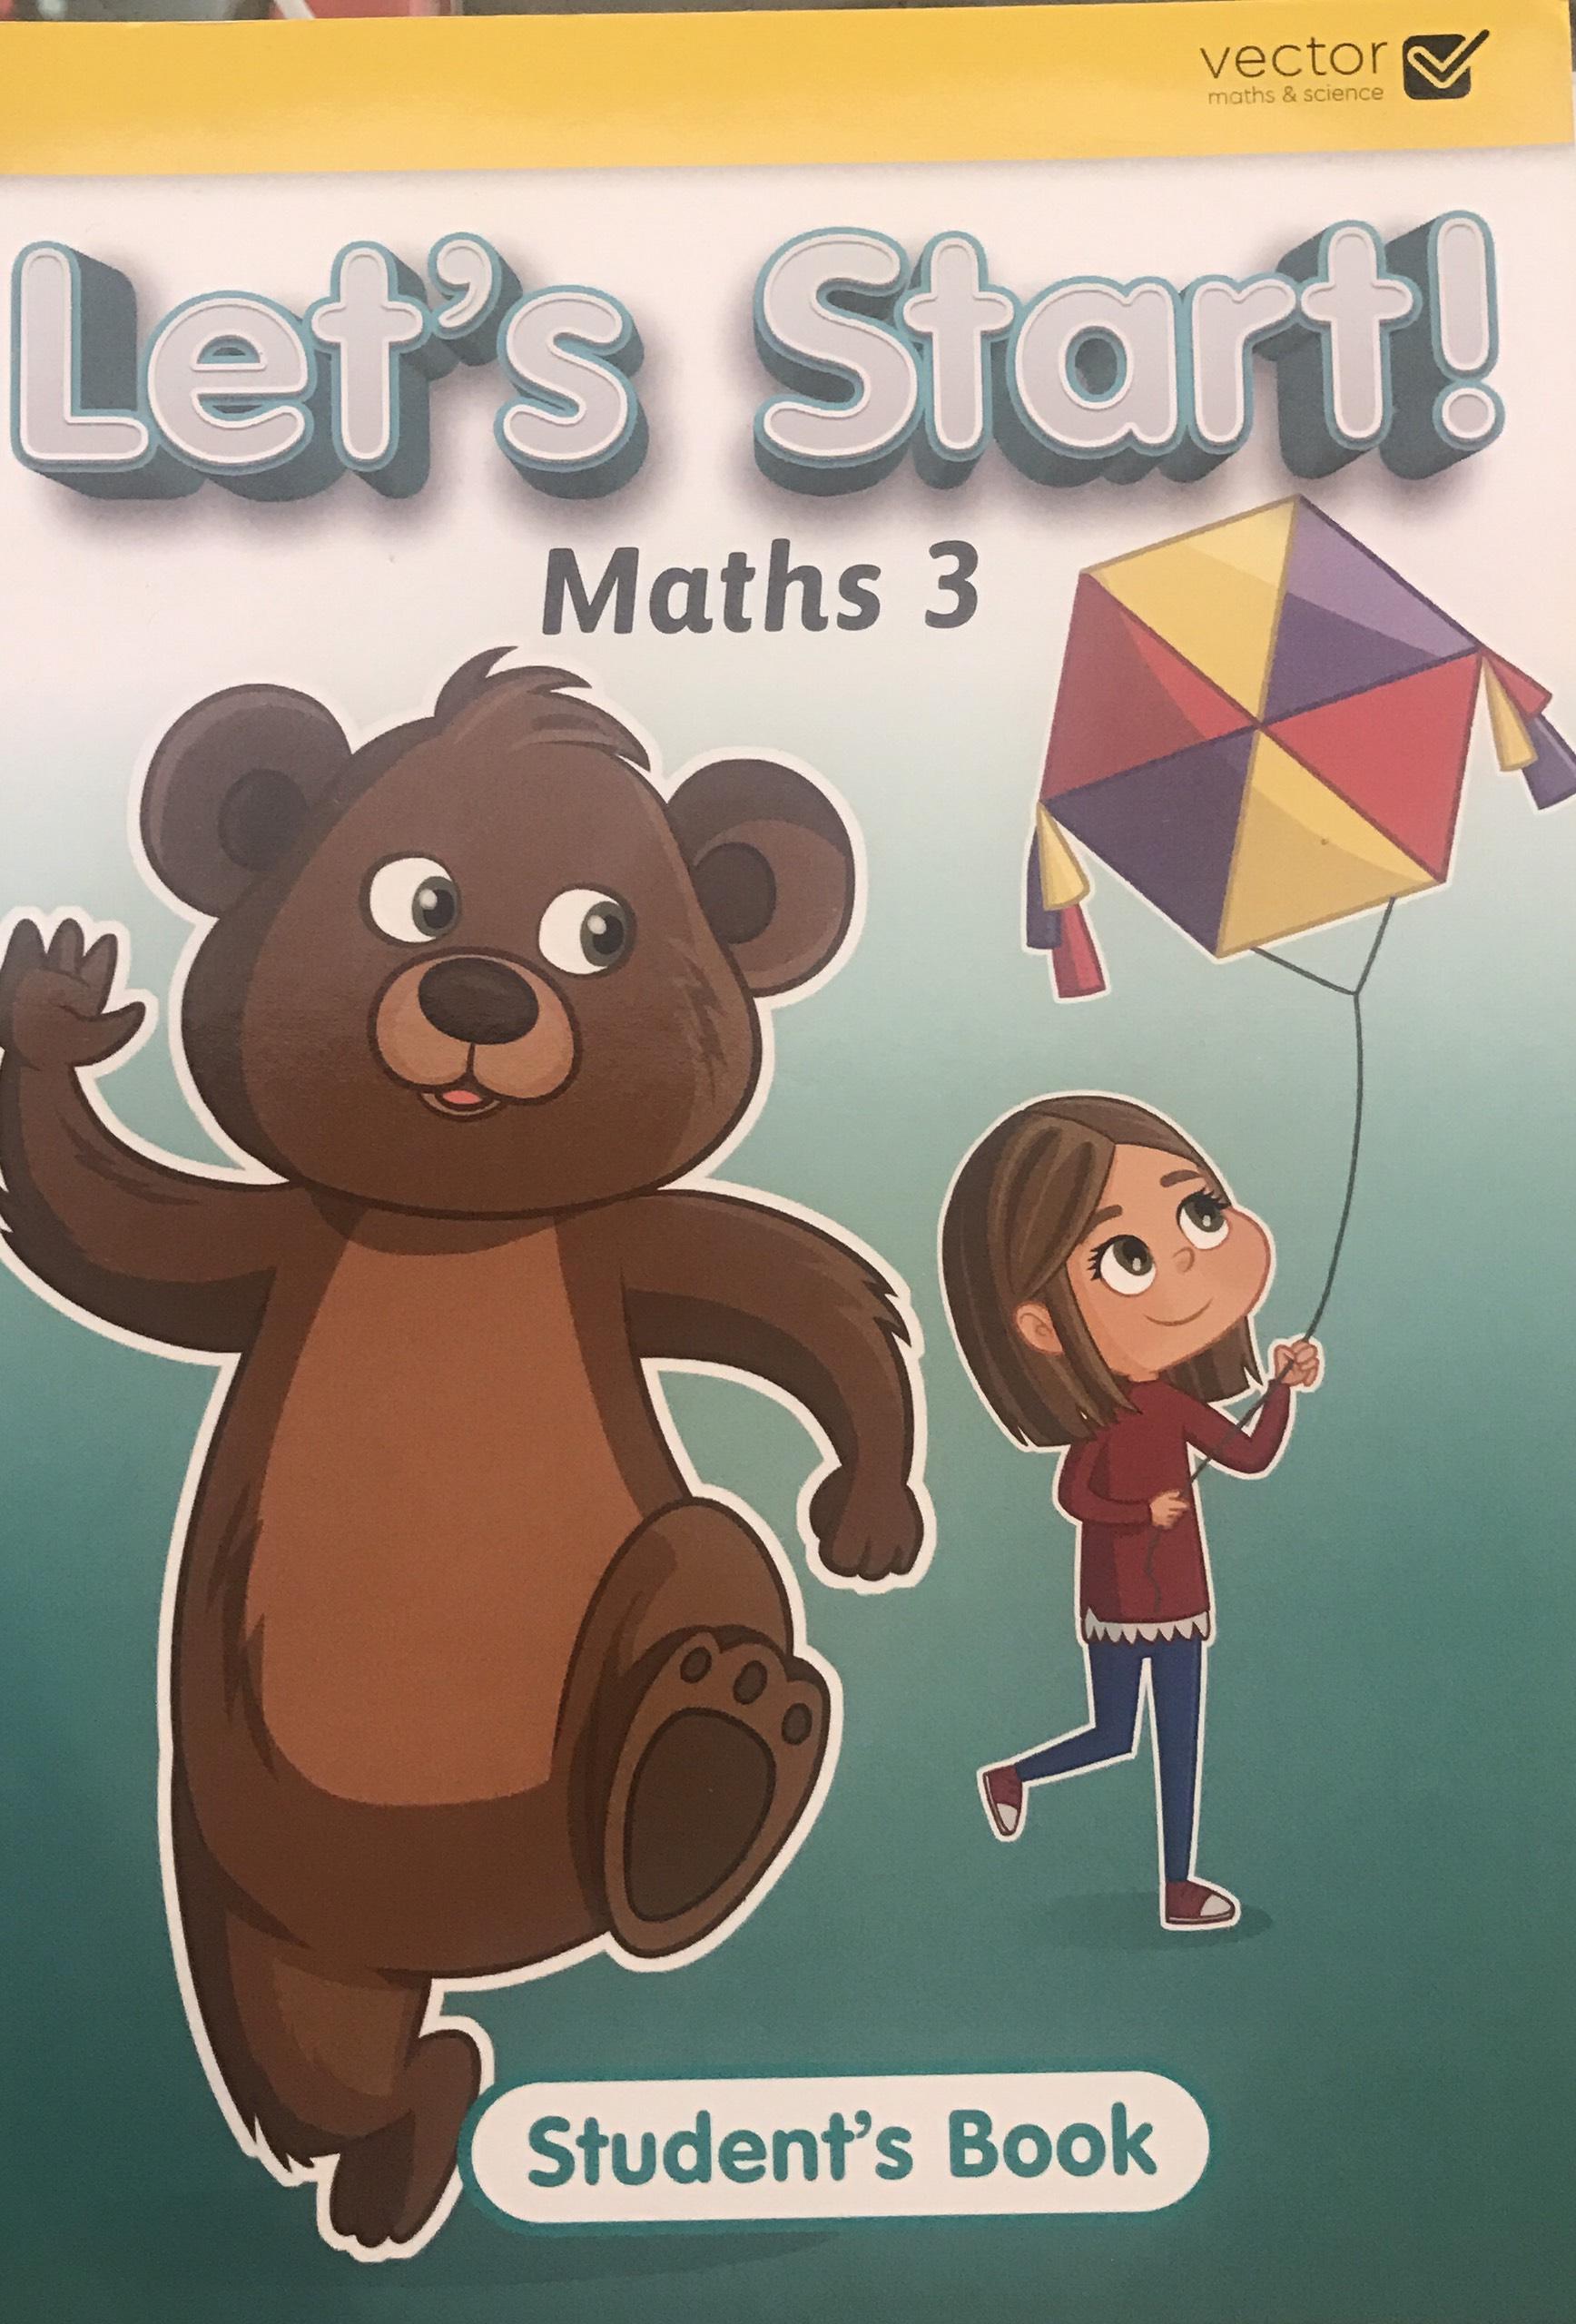 Vector: Sách hệ Singapore - Học toán bằng tiếng Anh - Let's Start! Maths 3 Student's Book